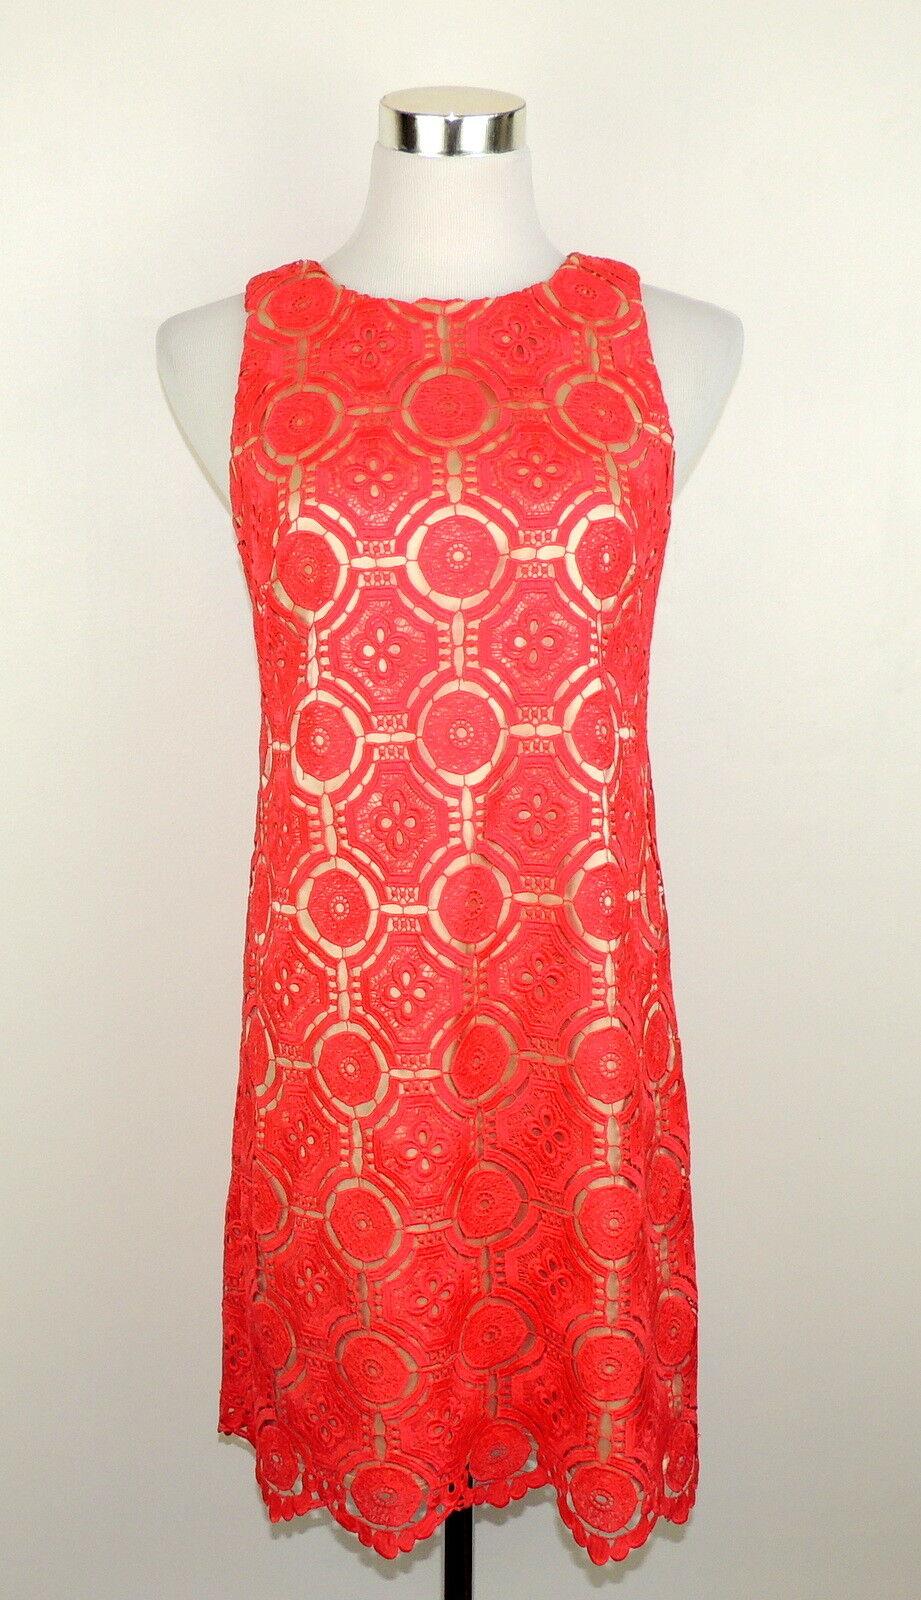 Eliza J Womens Womens Womens 2 Dress Romantic orange Crochet Lace Over Satin Beige Liner c2ab15